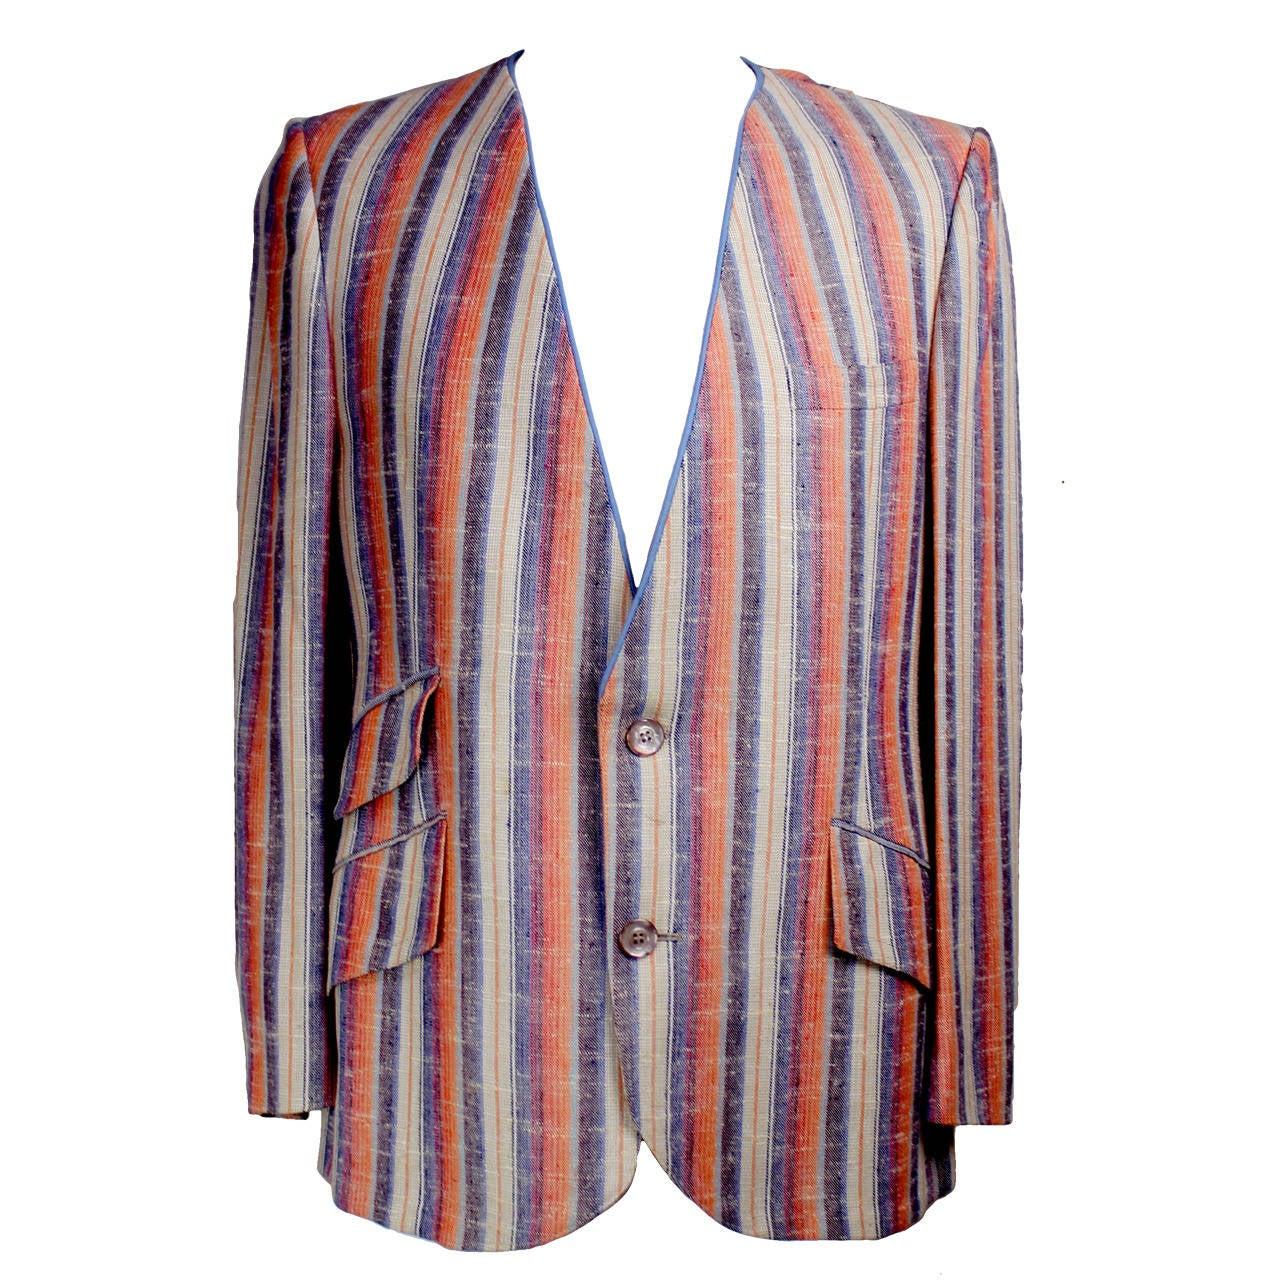 1960s Men's Striped Hardy Amies Designed Mod Suit Jacket